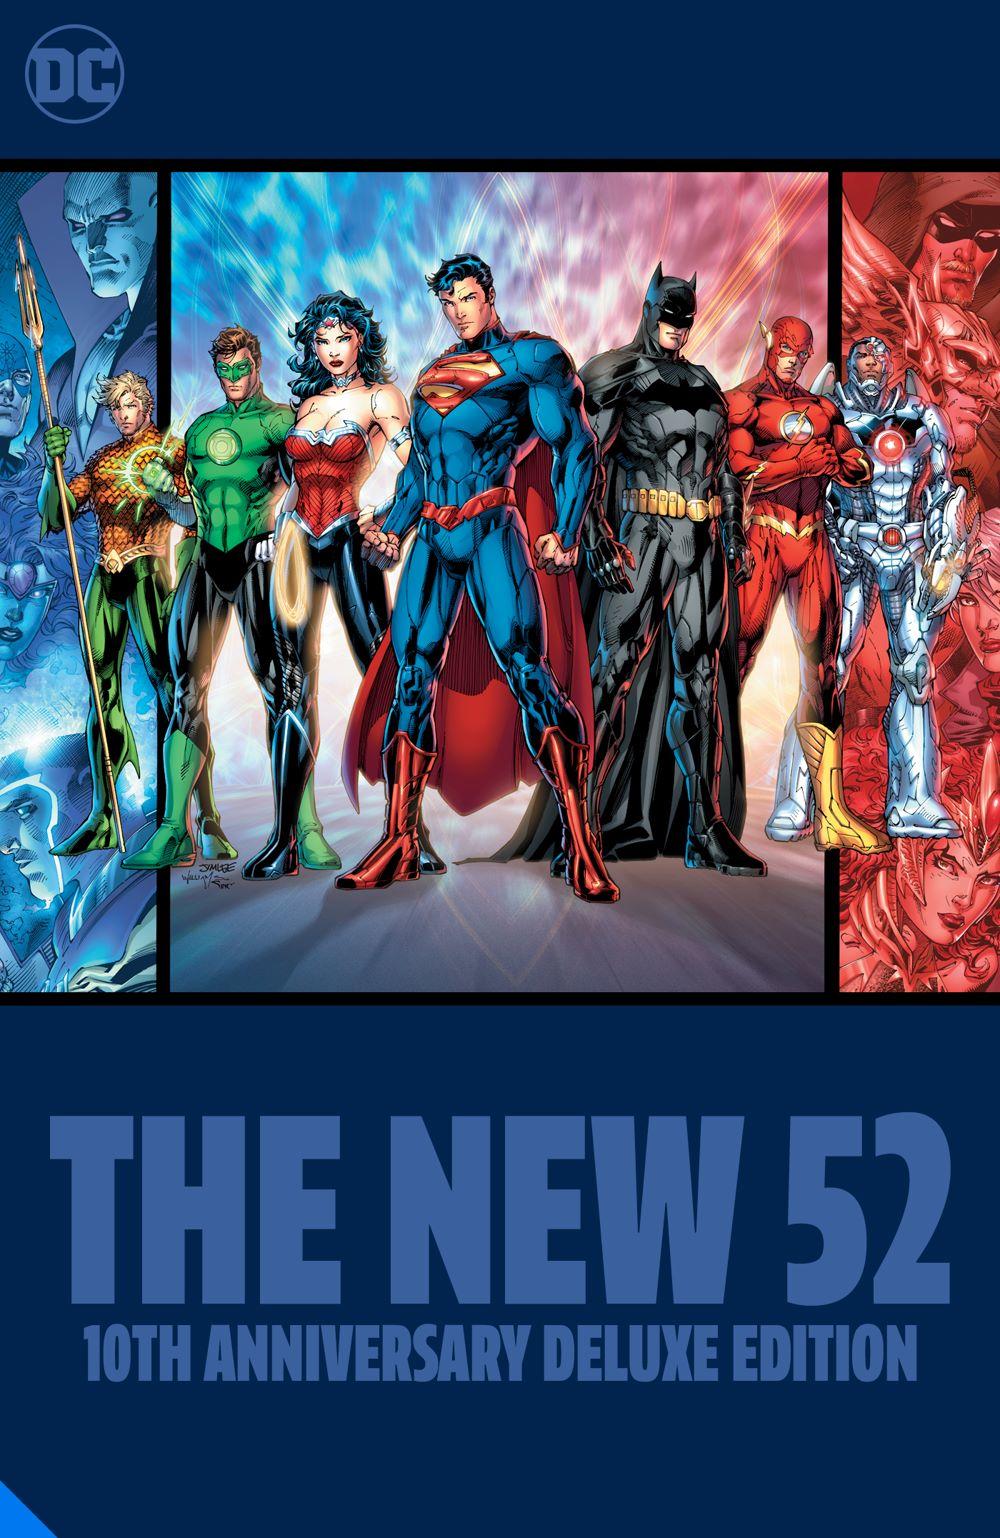 thenew52-10thanniv-dlx_adv DC Comics June 2021 Solicitations